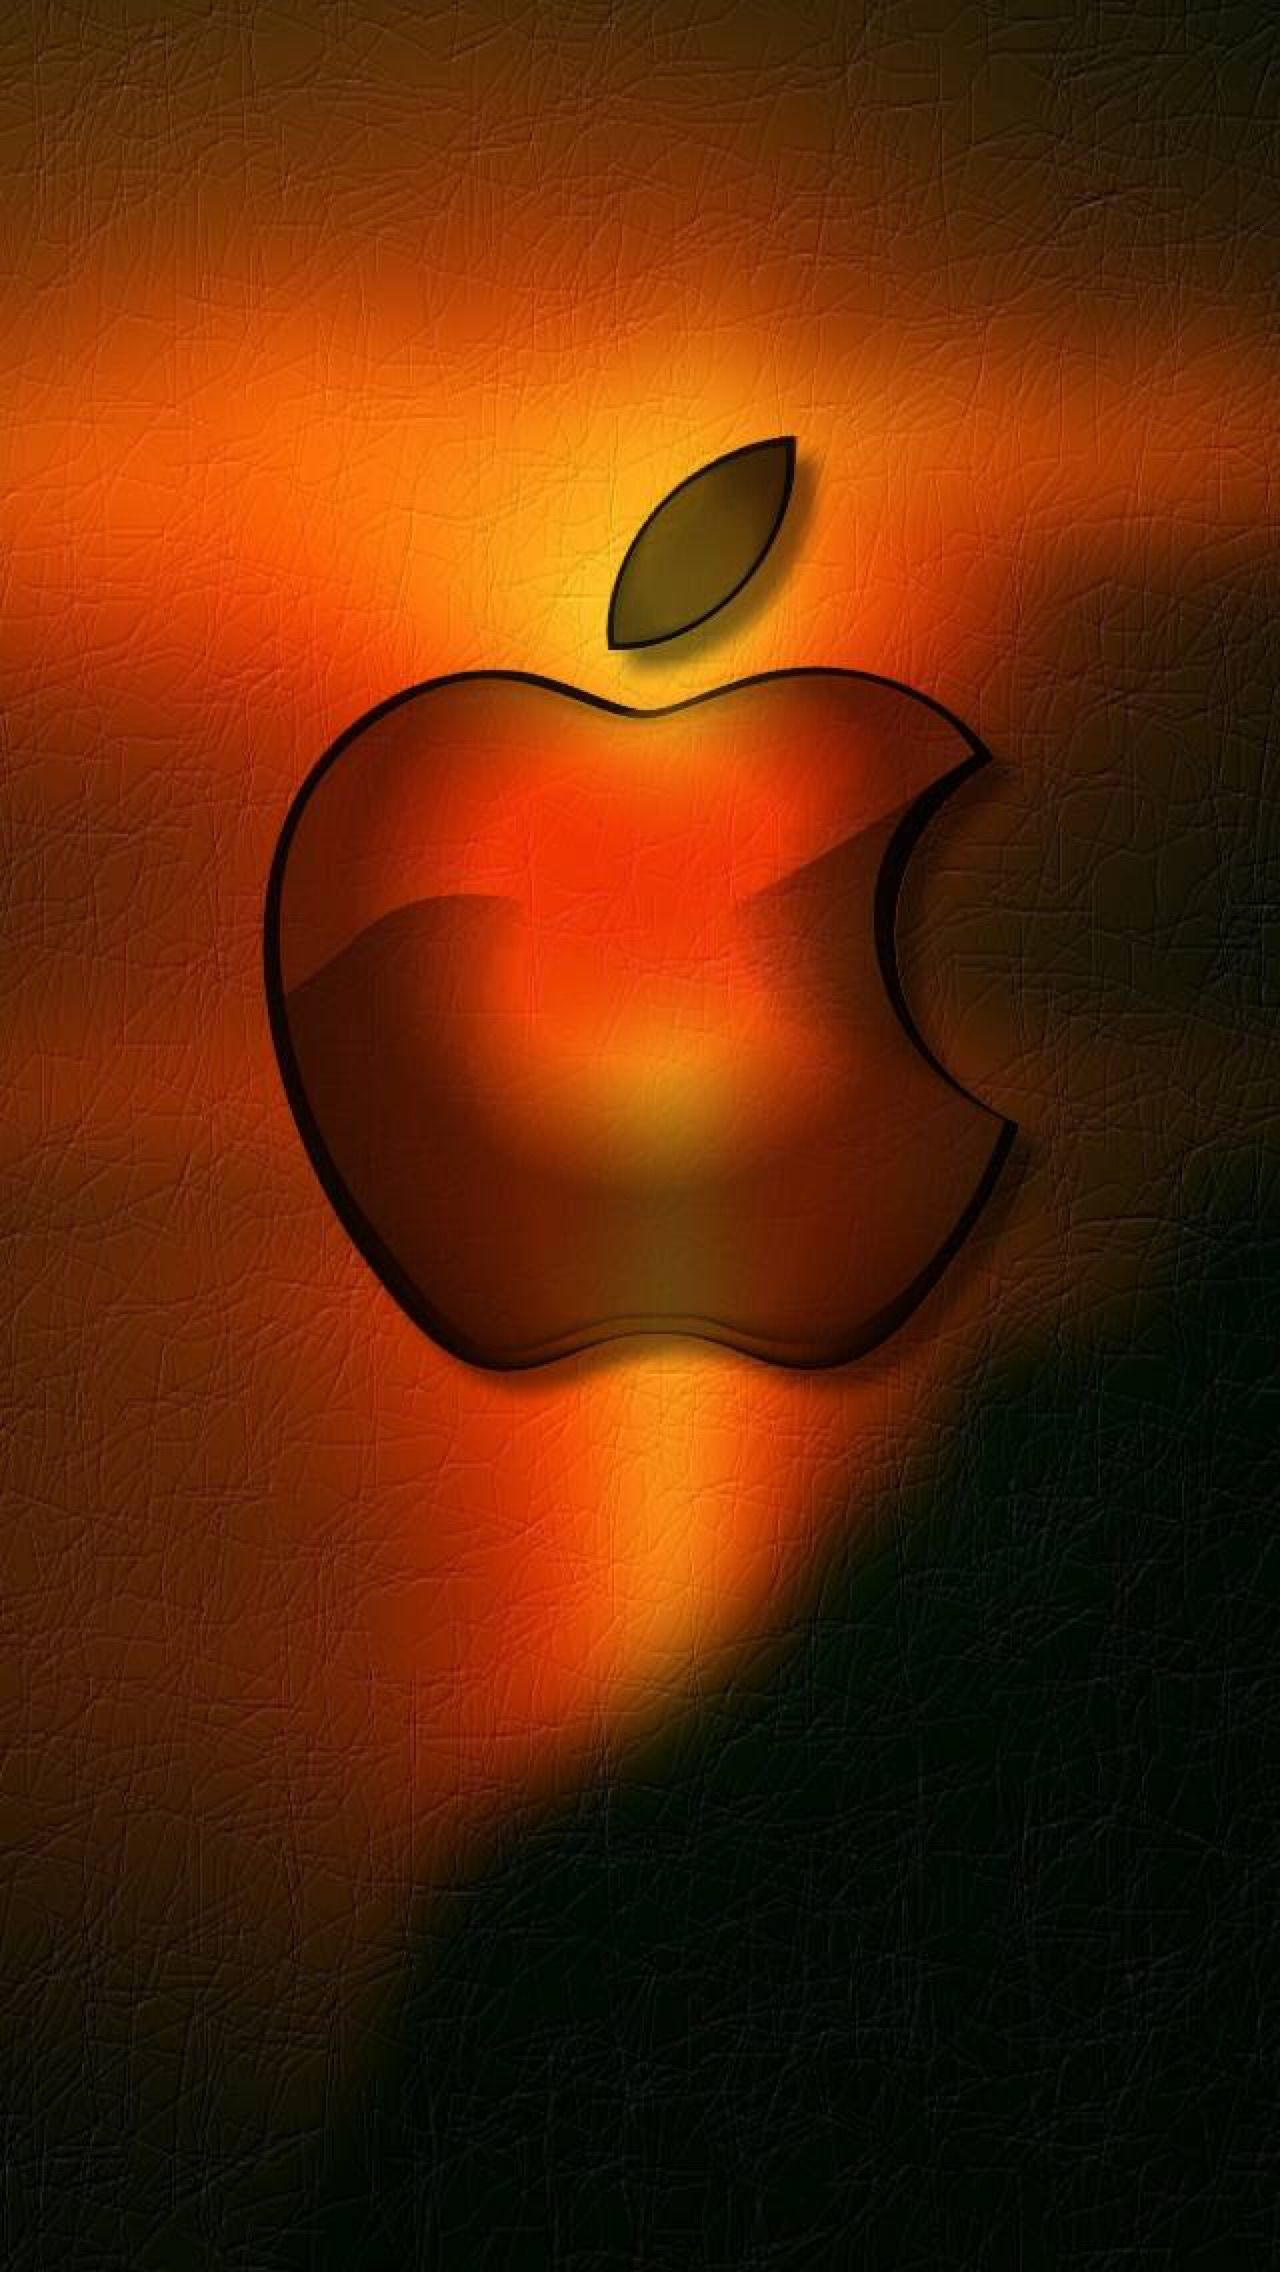 Pin By Mojgan On Appel Apple Wallpaper Apple Logo Wallpaper